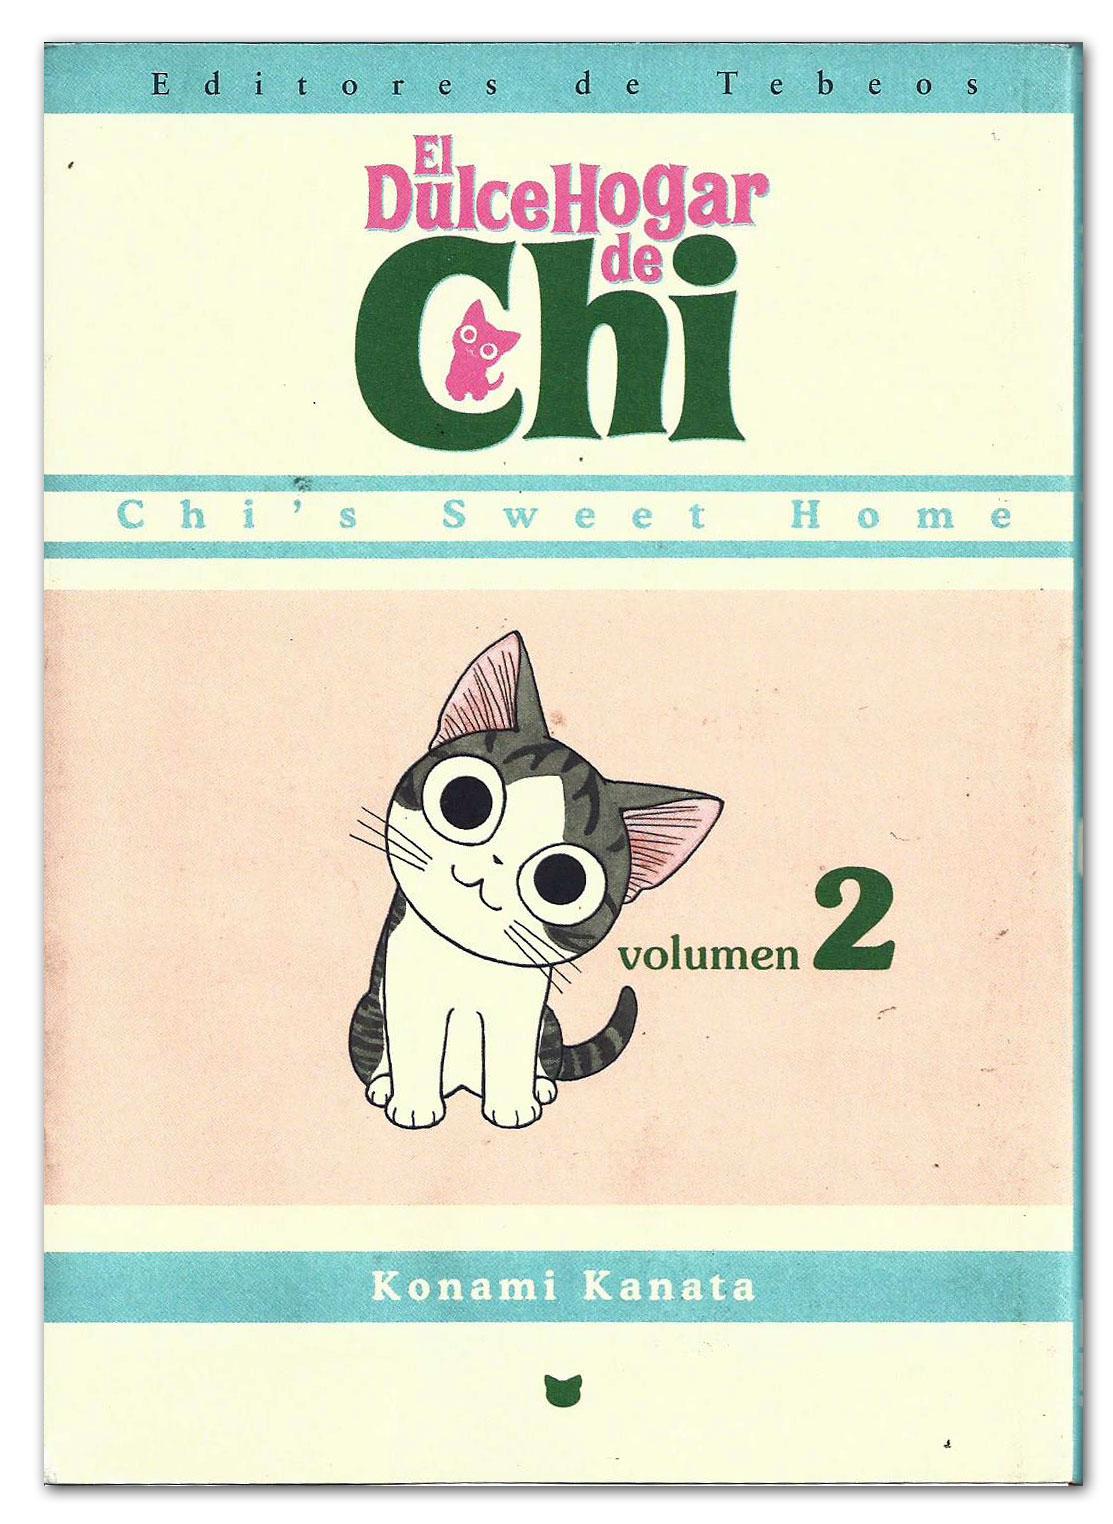 El dulce hogar de Chi - Konami Kanata